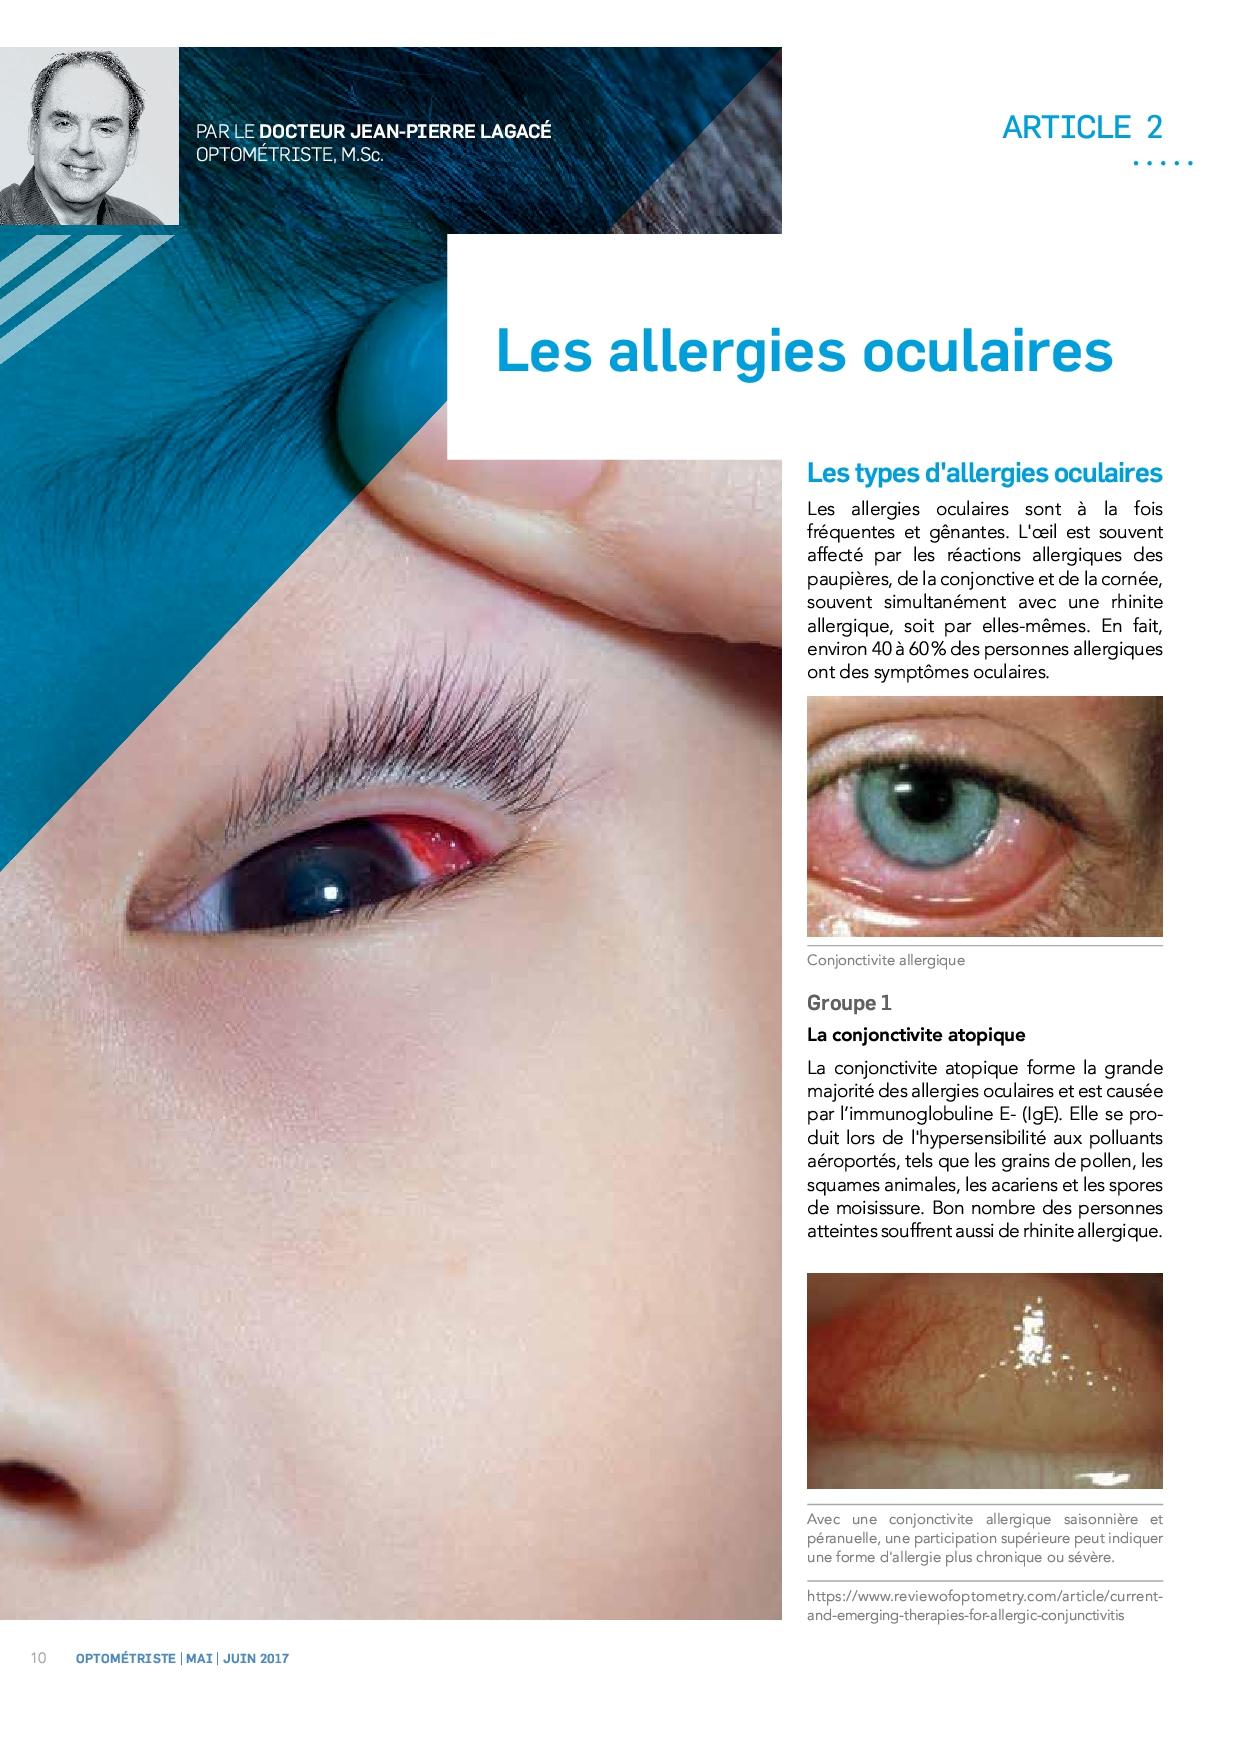 Les allergies oculaires